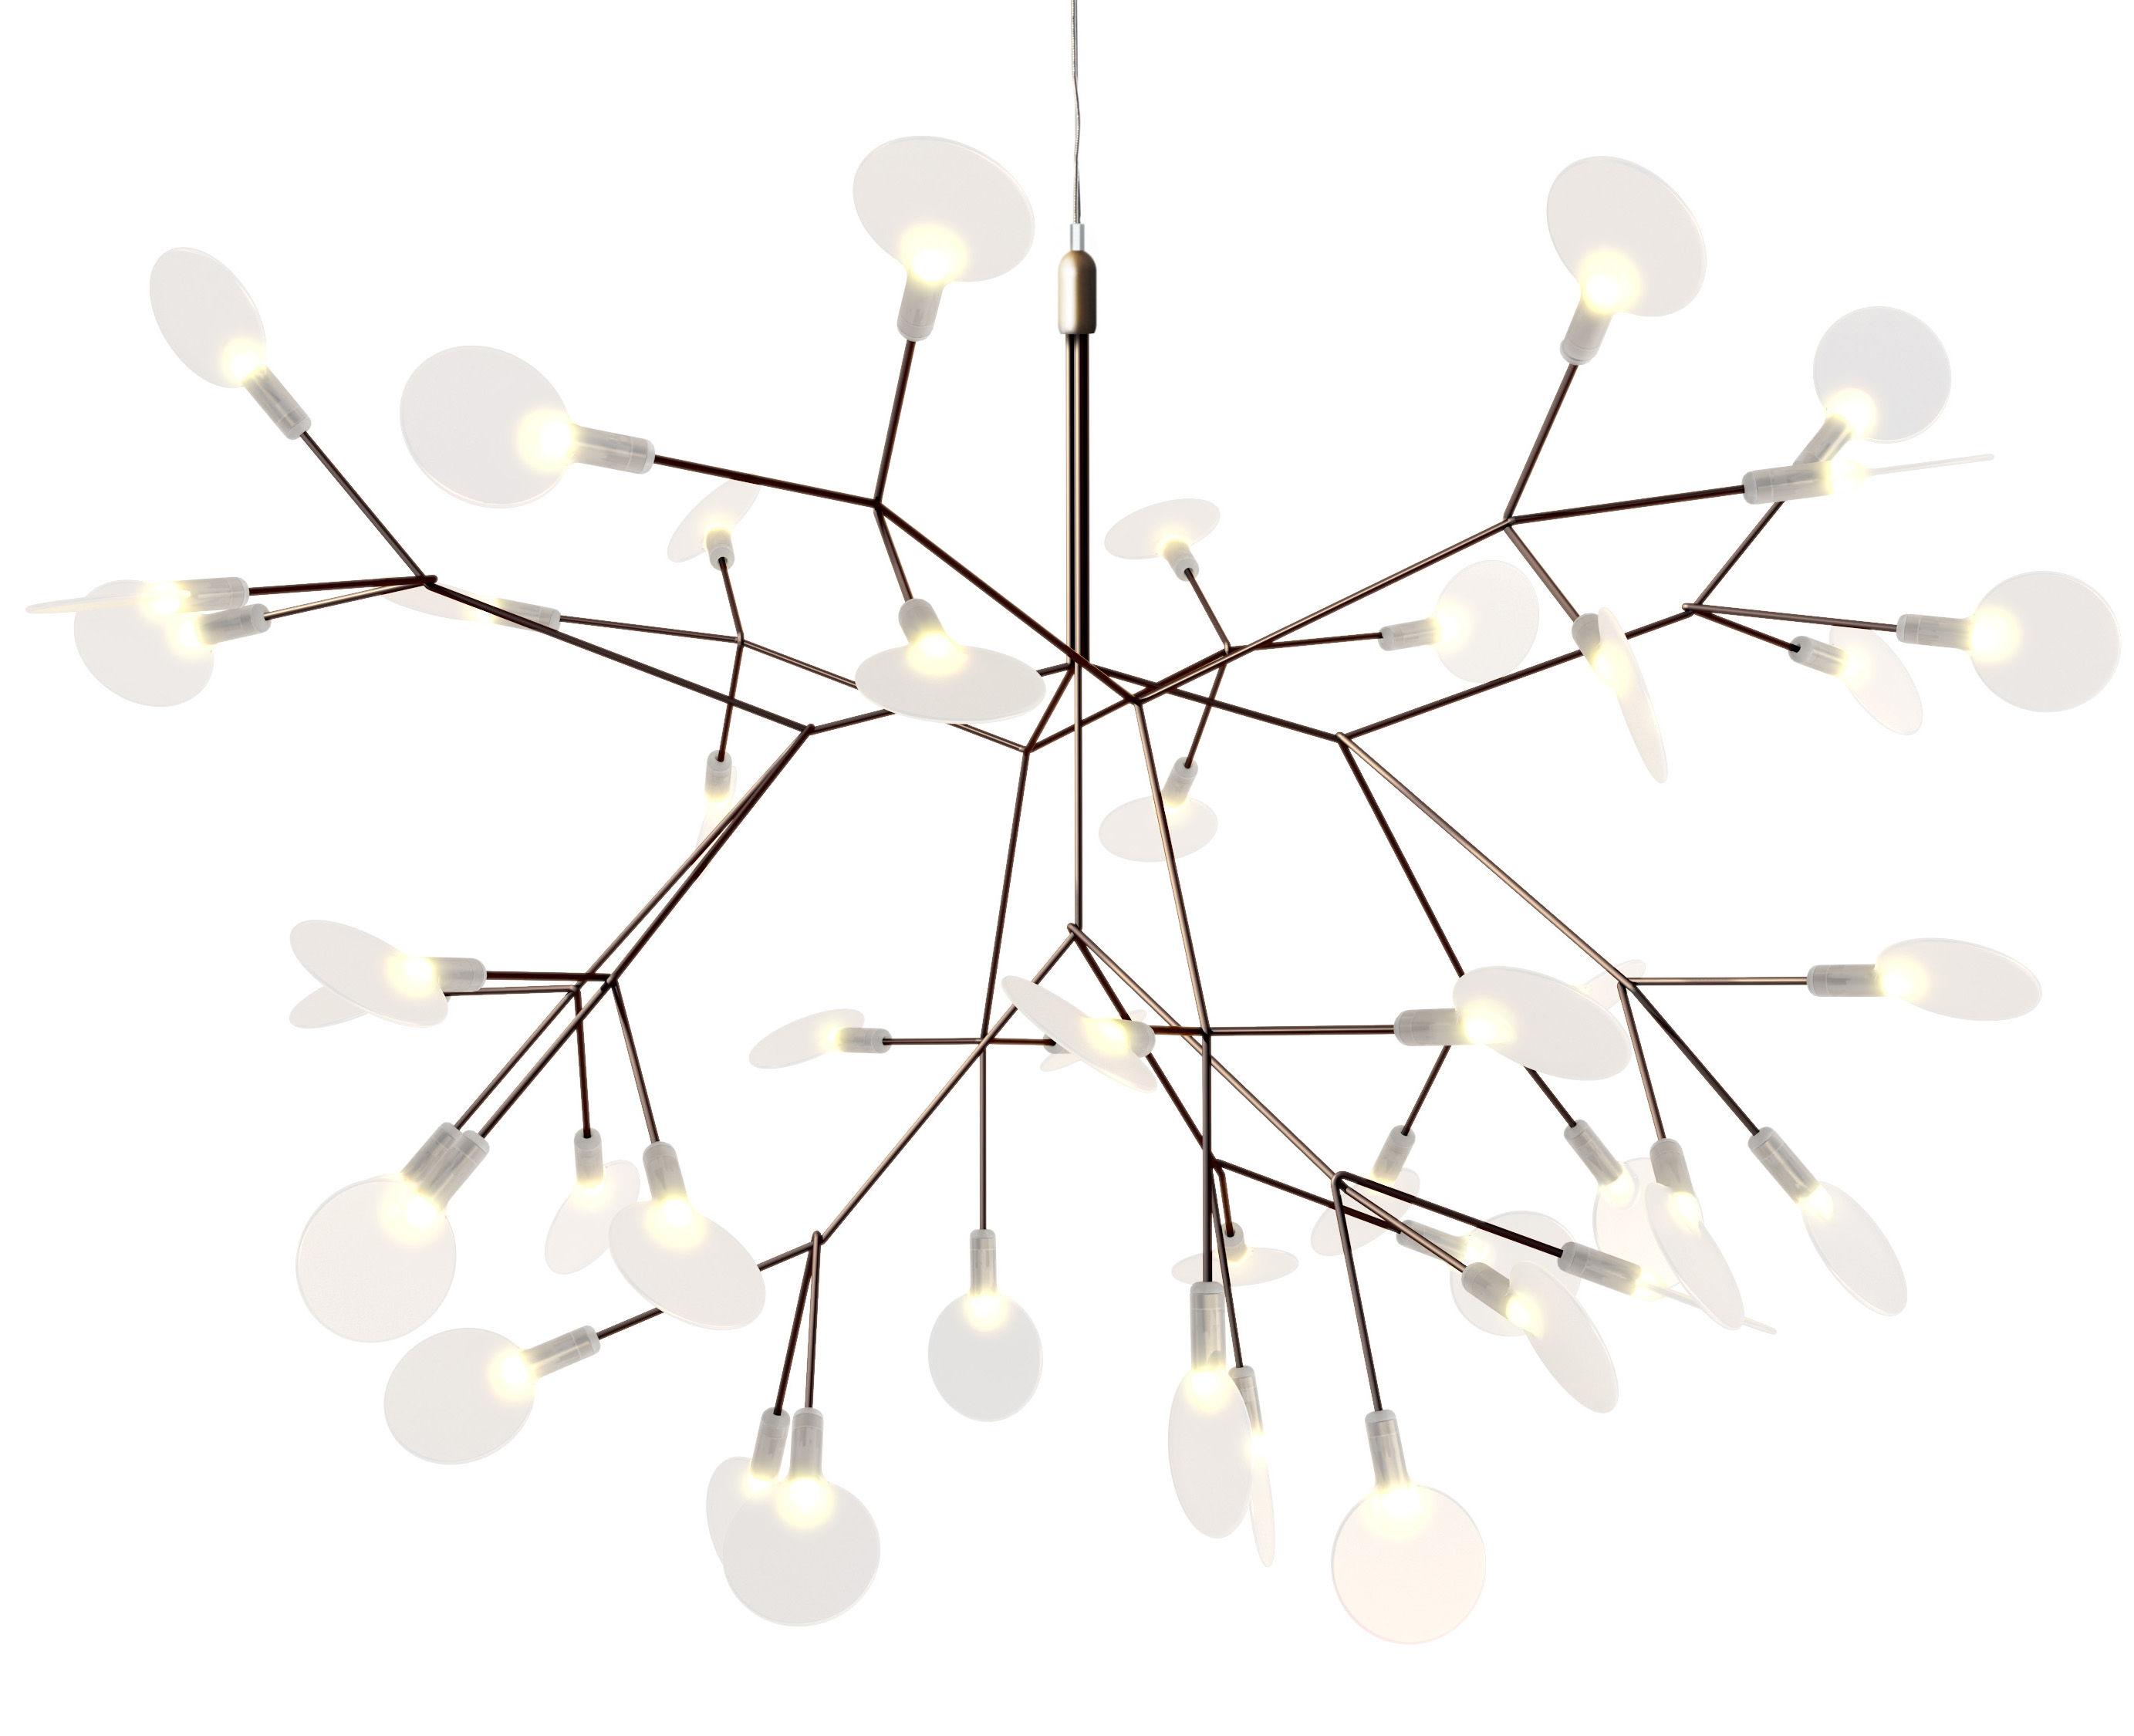 Lighting - Pendant Lighting - Heracleum II Small Pendant by Moooi - Copper - Metal, Polycarbonate, Steel